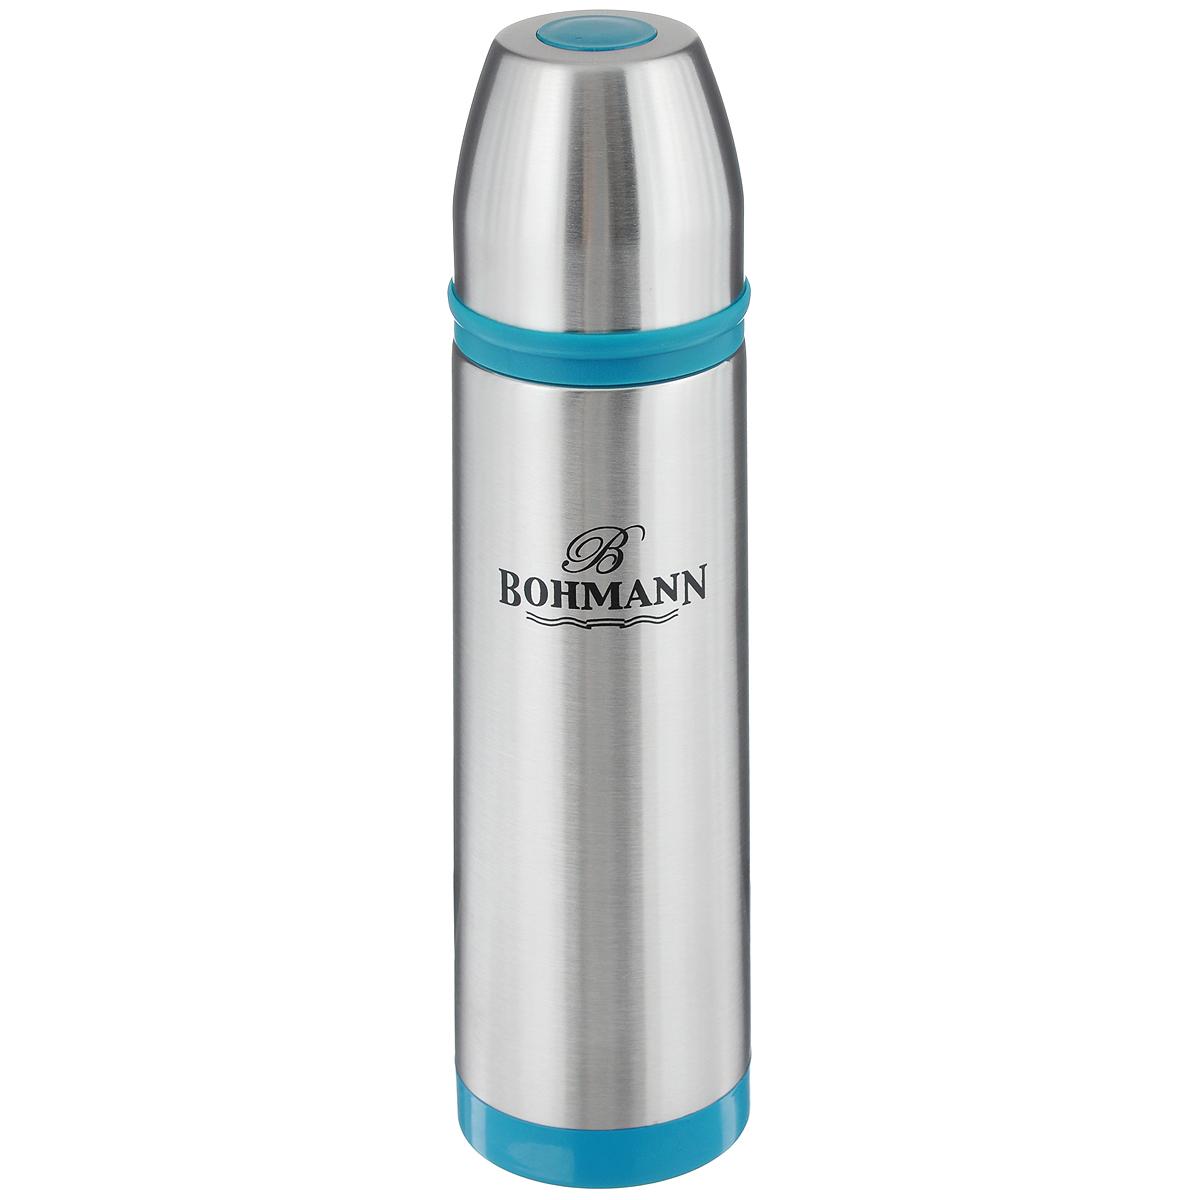 Термос Bohmann, цвет: металлик, голубой, 1 л. 4492BHNEW